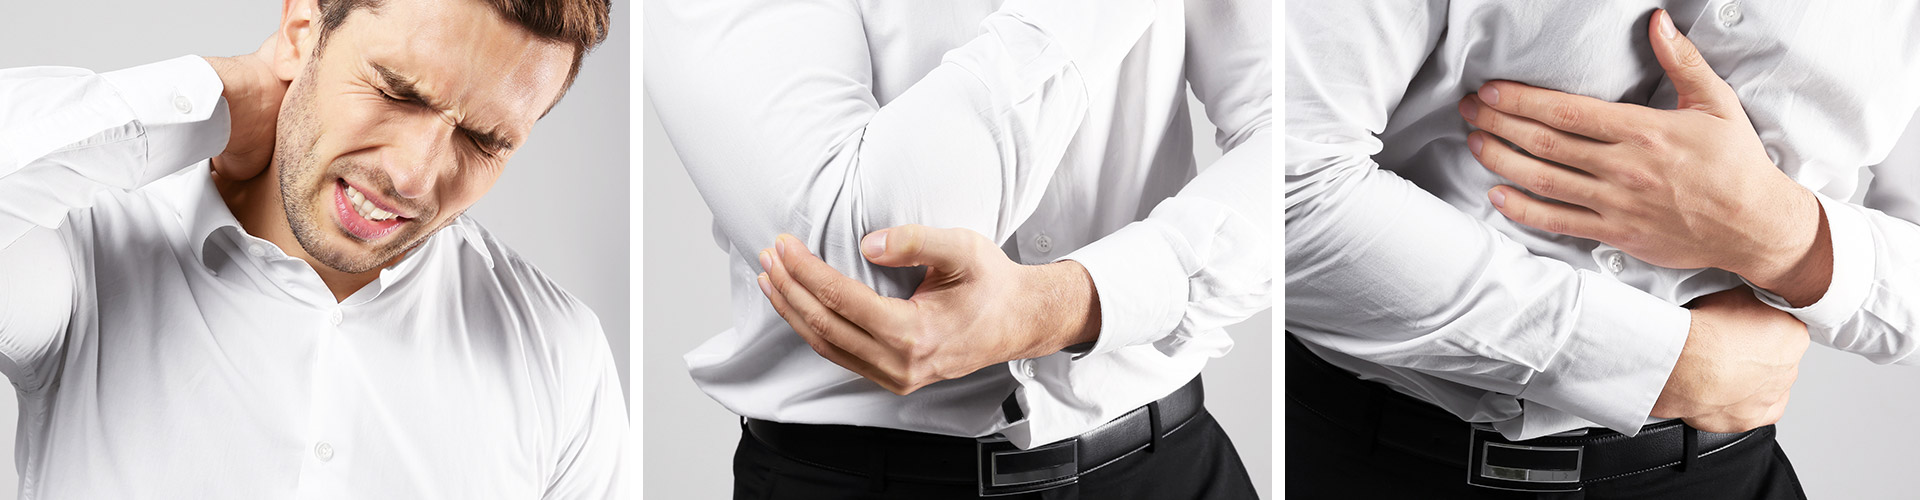 nackenschmerzen ellenbogenschmerzen bauchschmerzen